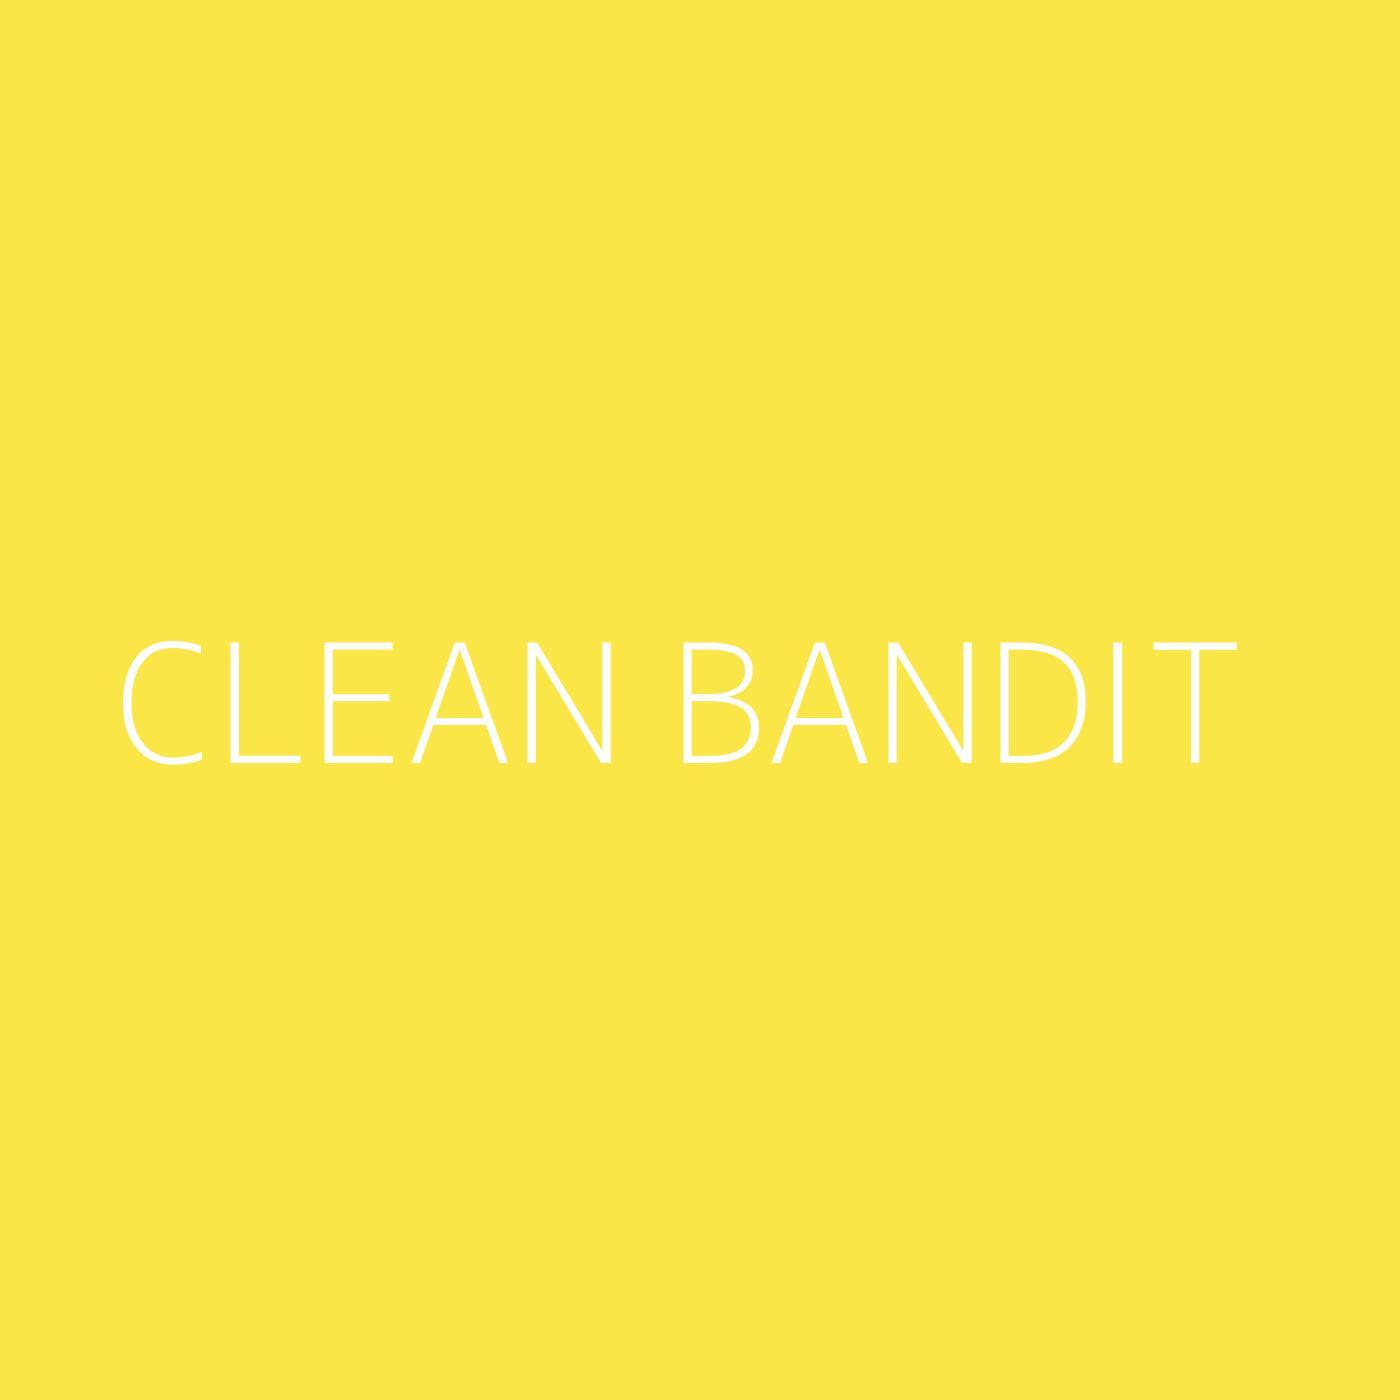 Clean Bandit Playlist Artwork